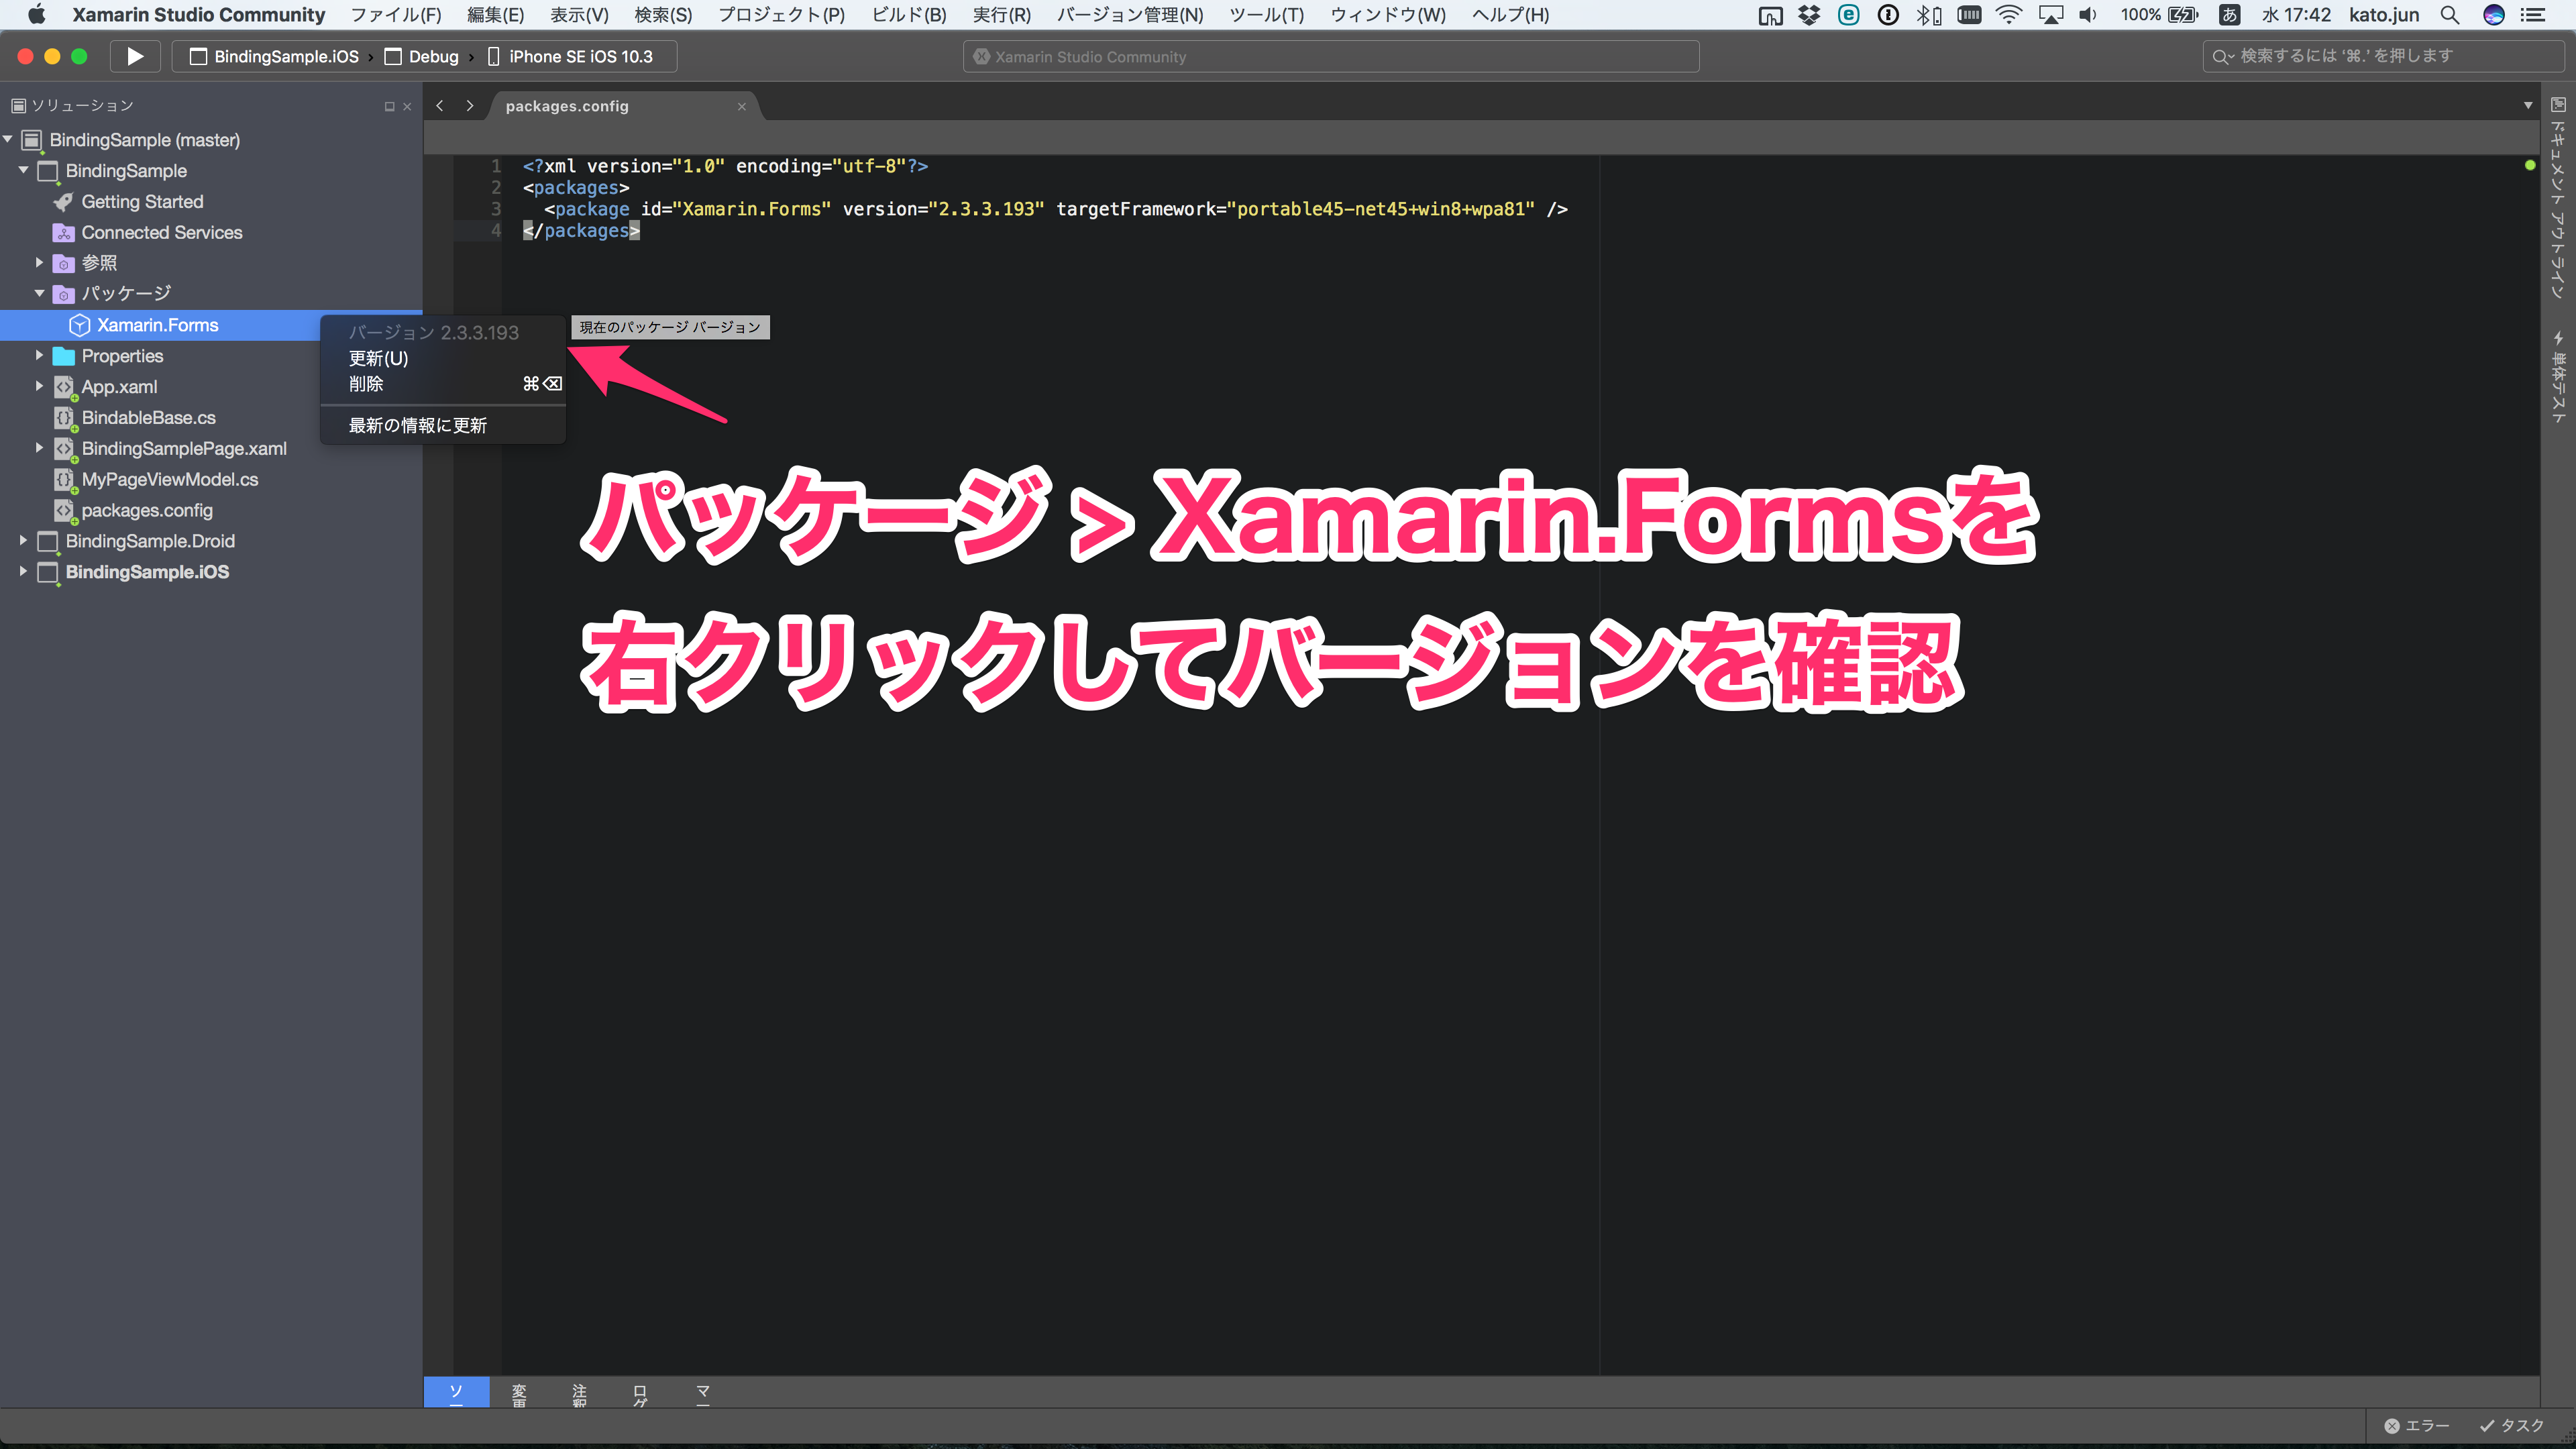 xamarin_forms_version_002